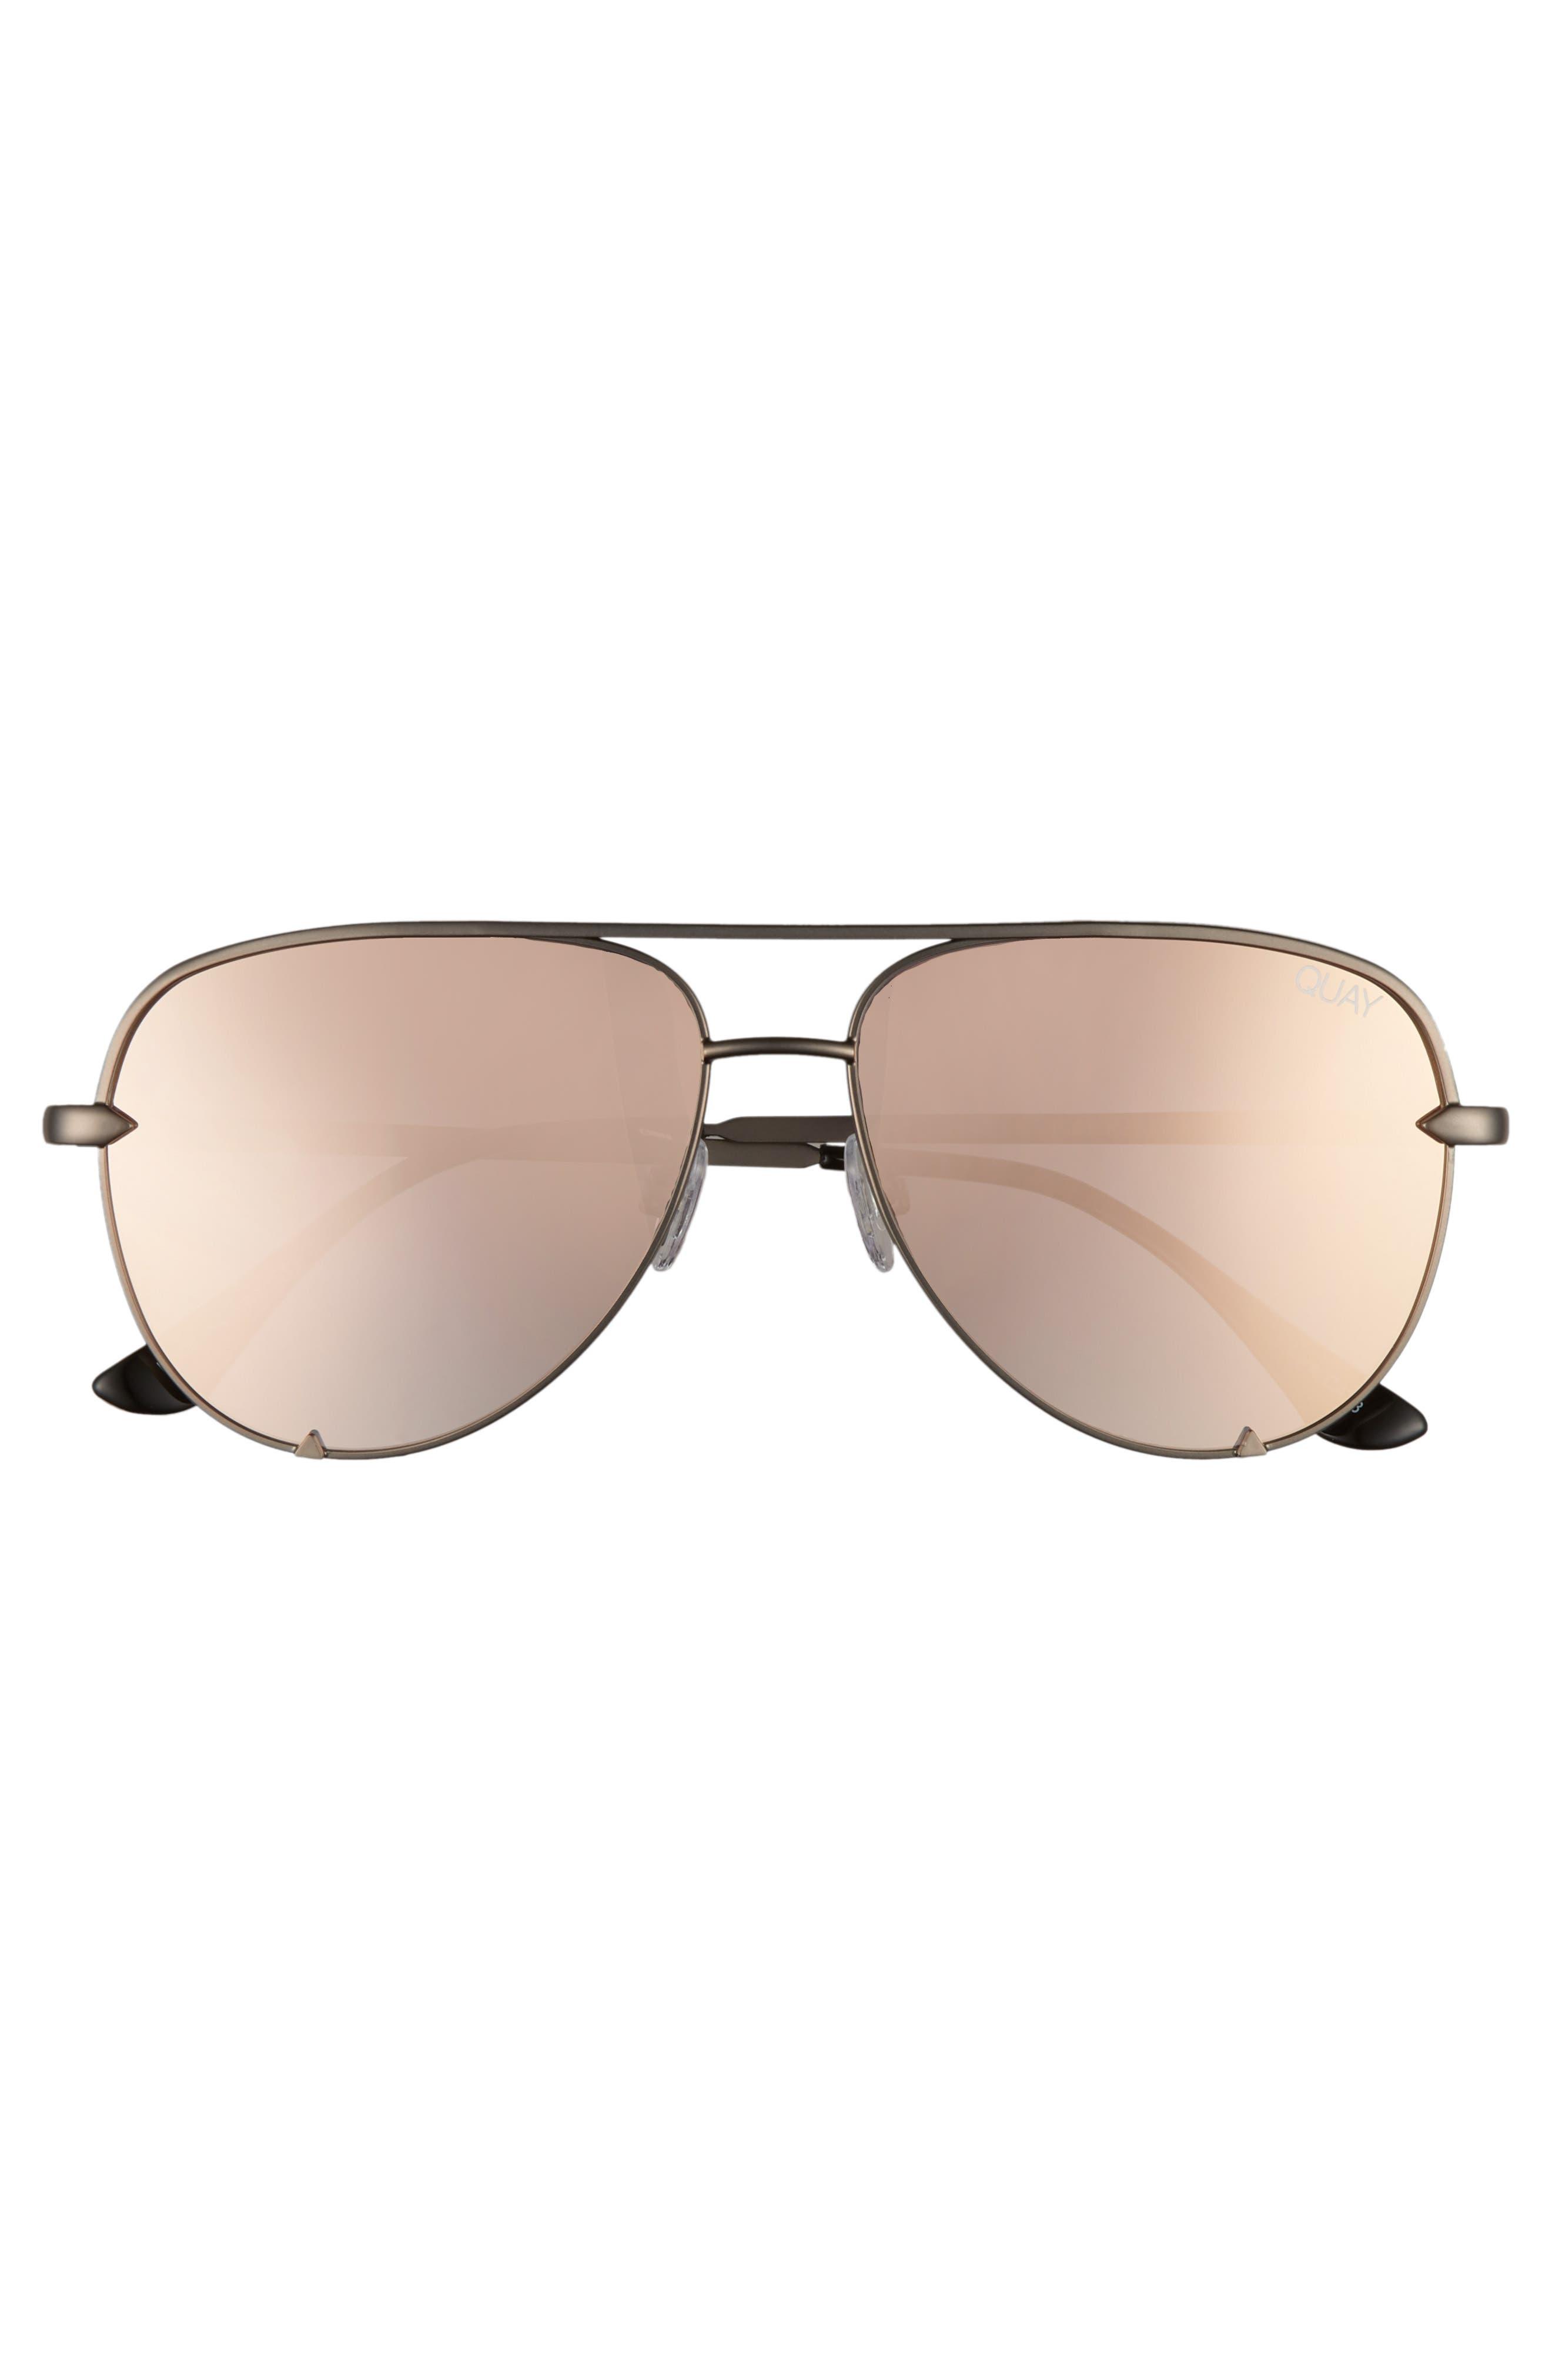 x Desi Perkins High Key Mini 57mm Aviator Sunglasses,                             Alternate thumbnail 3, color,                             GUNMETAL/ ROSE